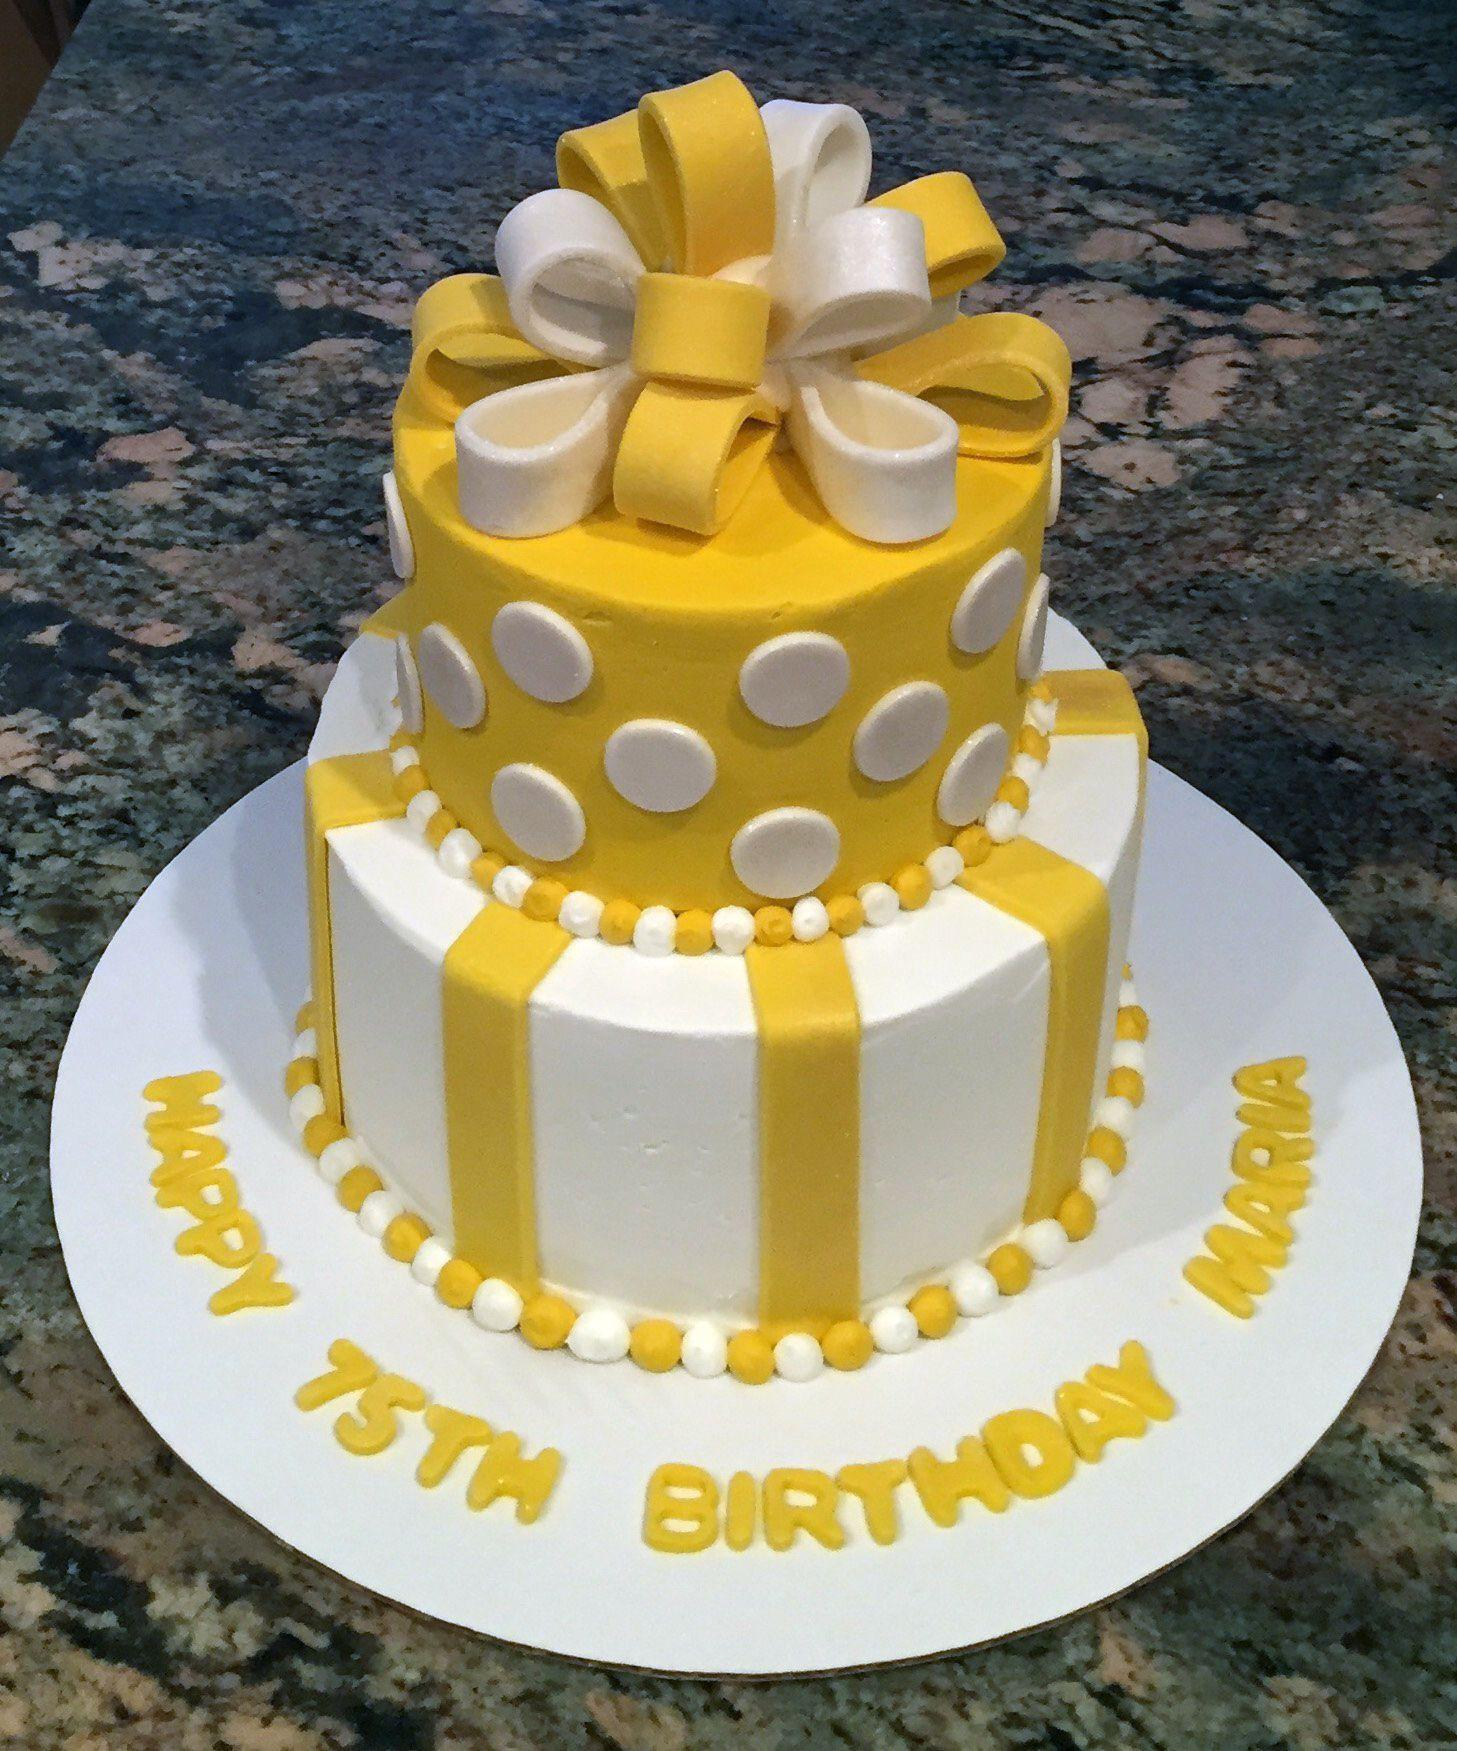 75th Birthday Cakes  75th Birthday Cake in 2020